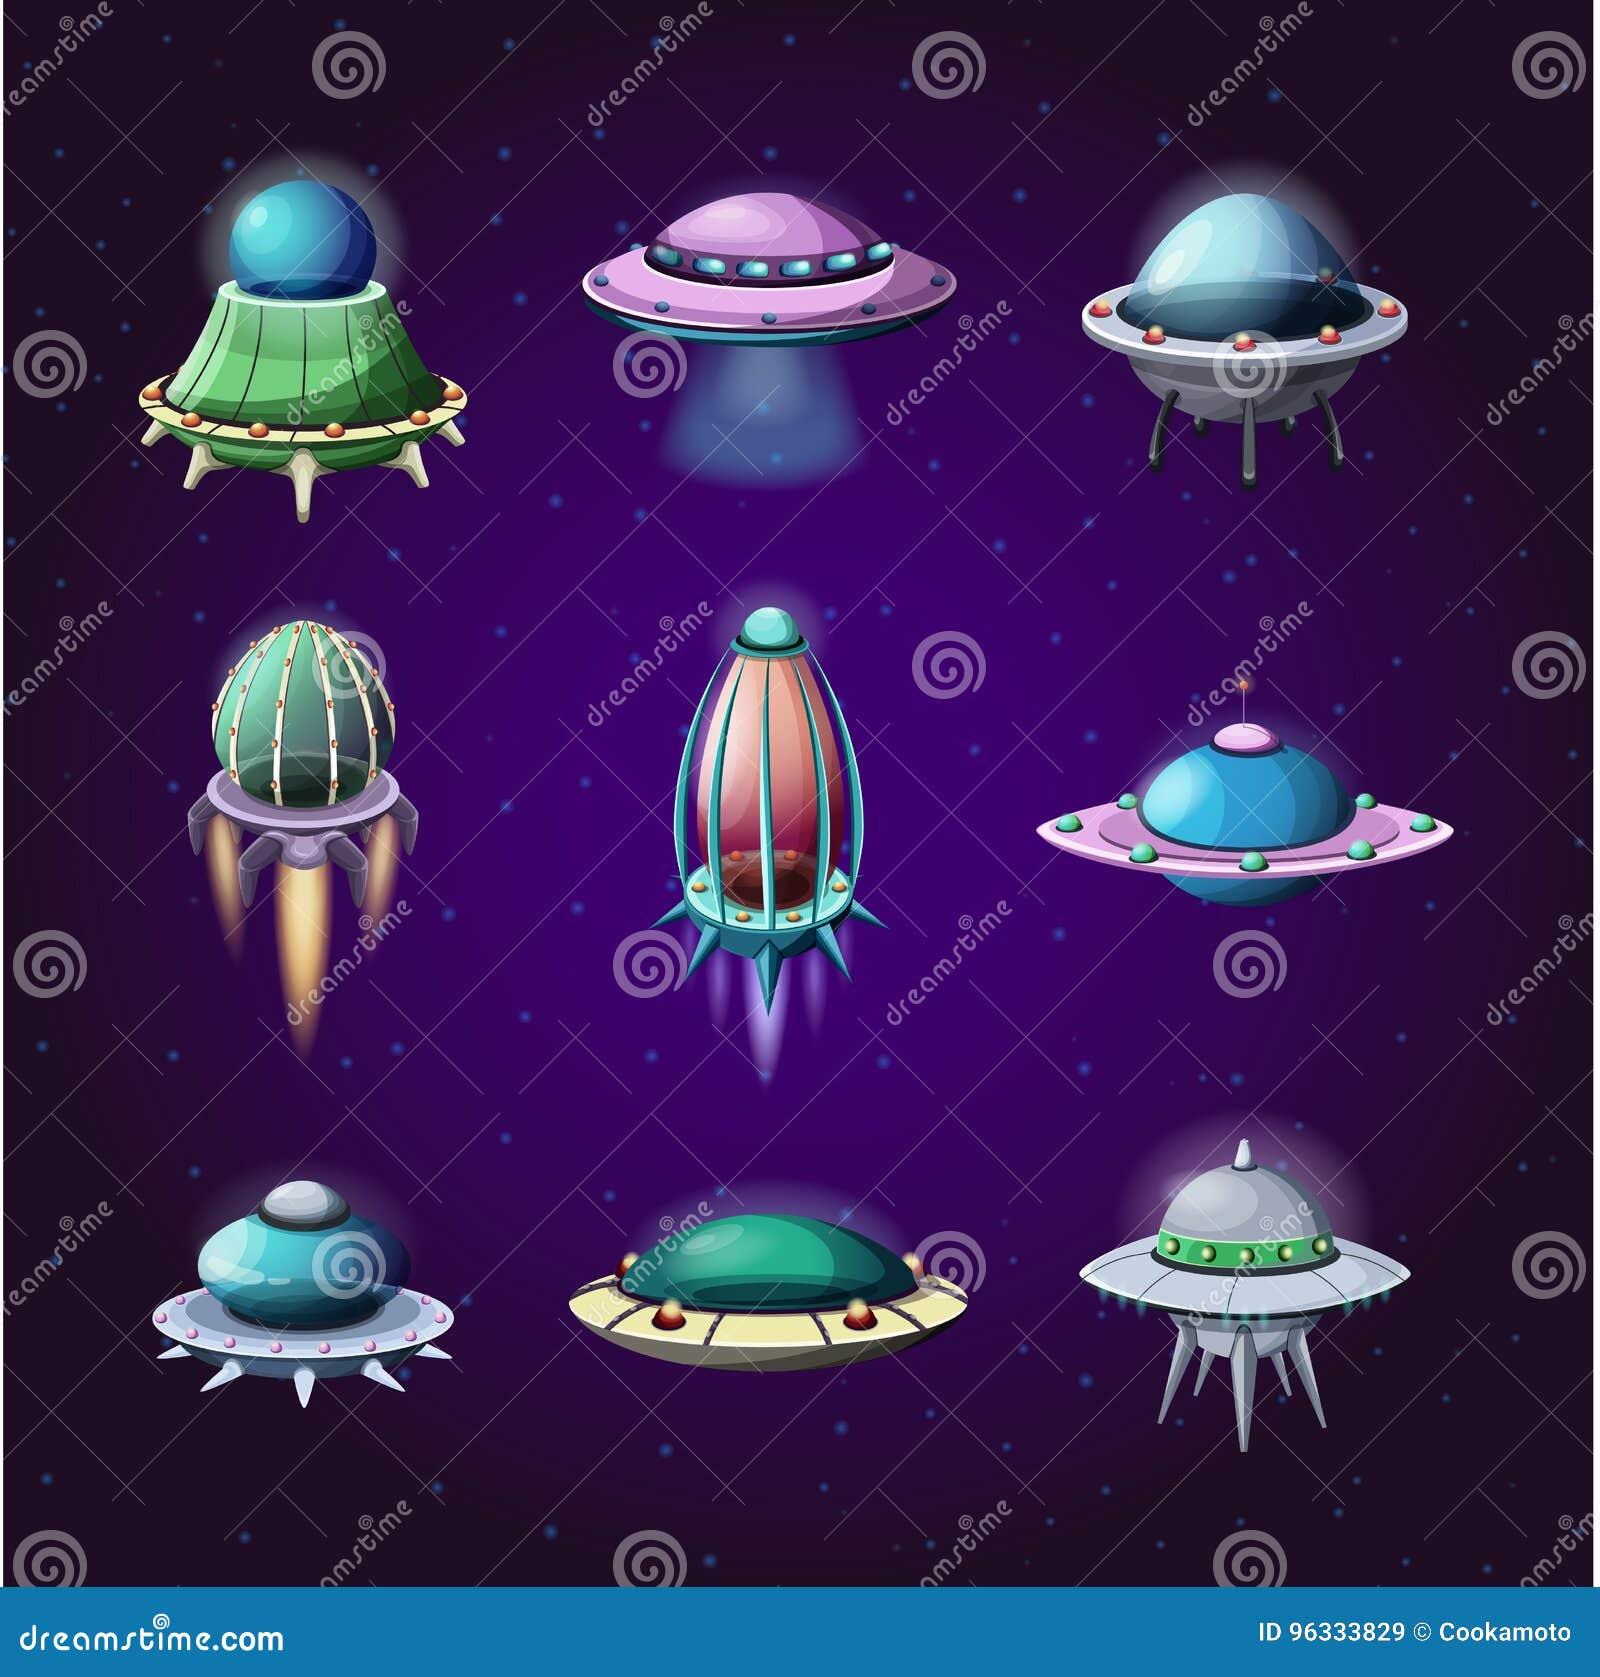 Set of cartoon rockets and alien spaceships